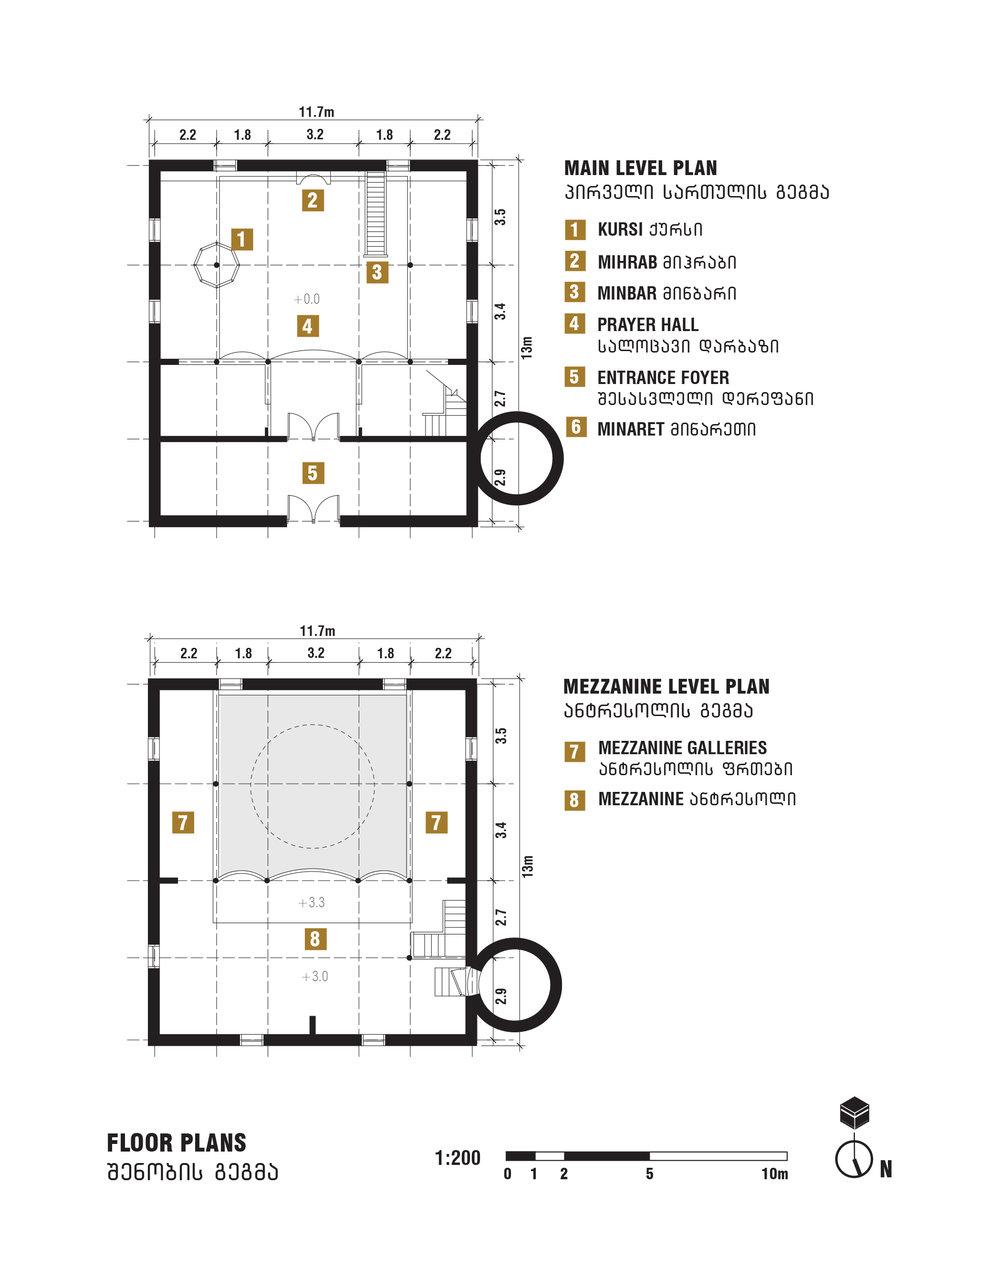 AGARA_Floorplans 1-200 copy.JPG